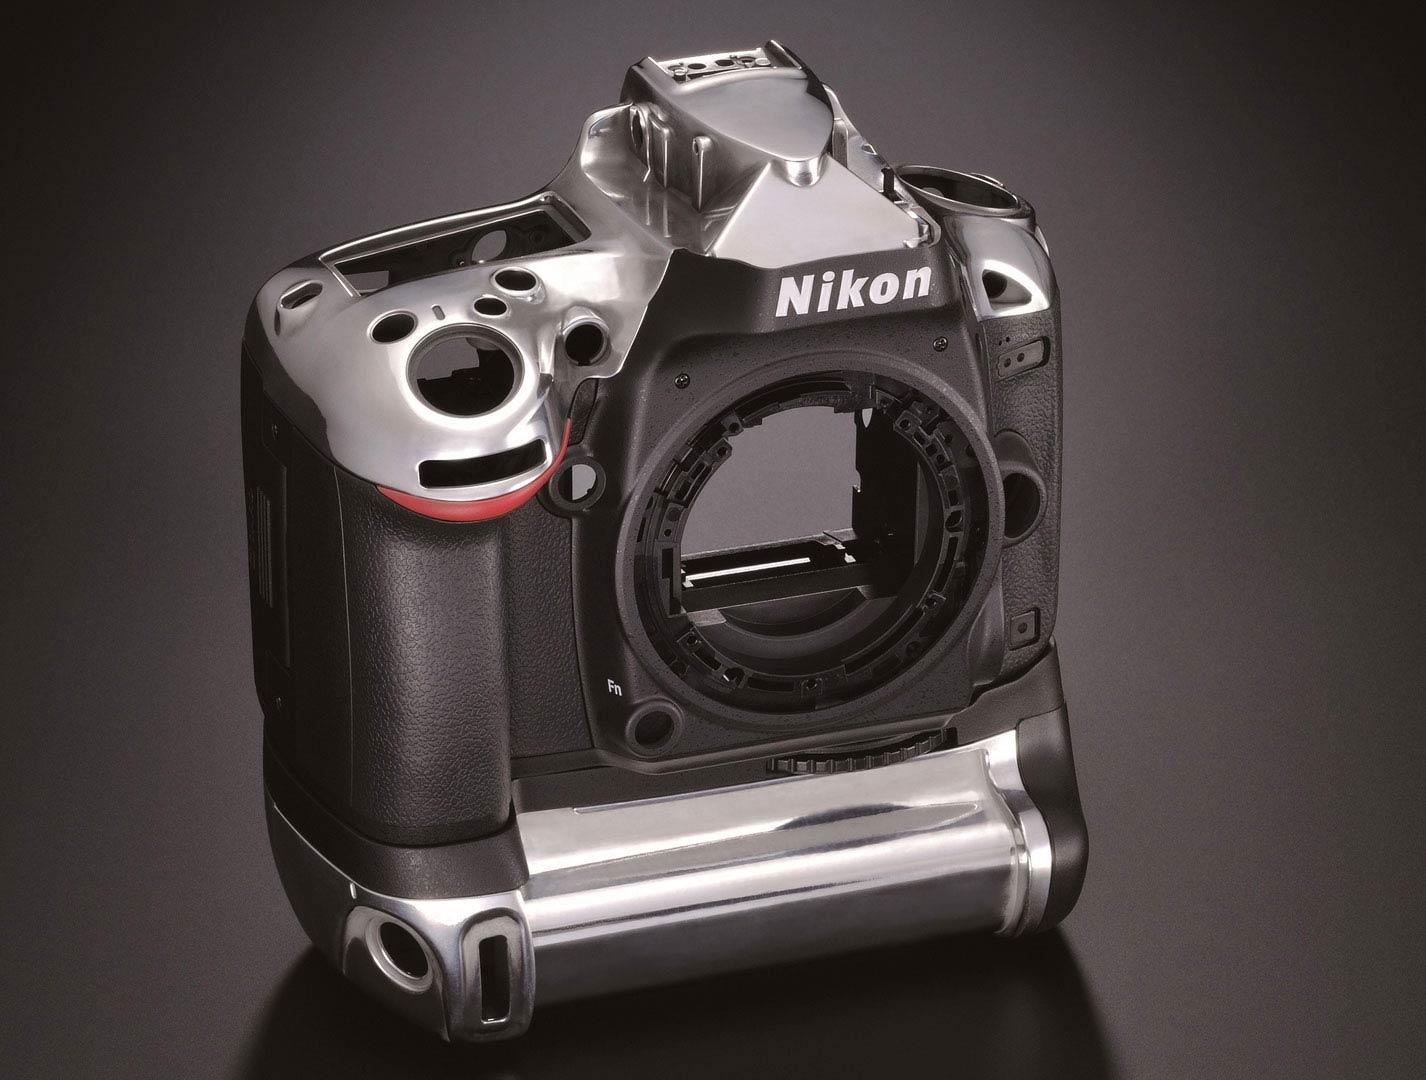 Nikon D600 Nikon Announces Entry Level Full Frame Slr